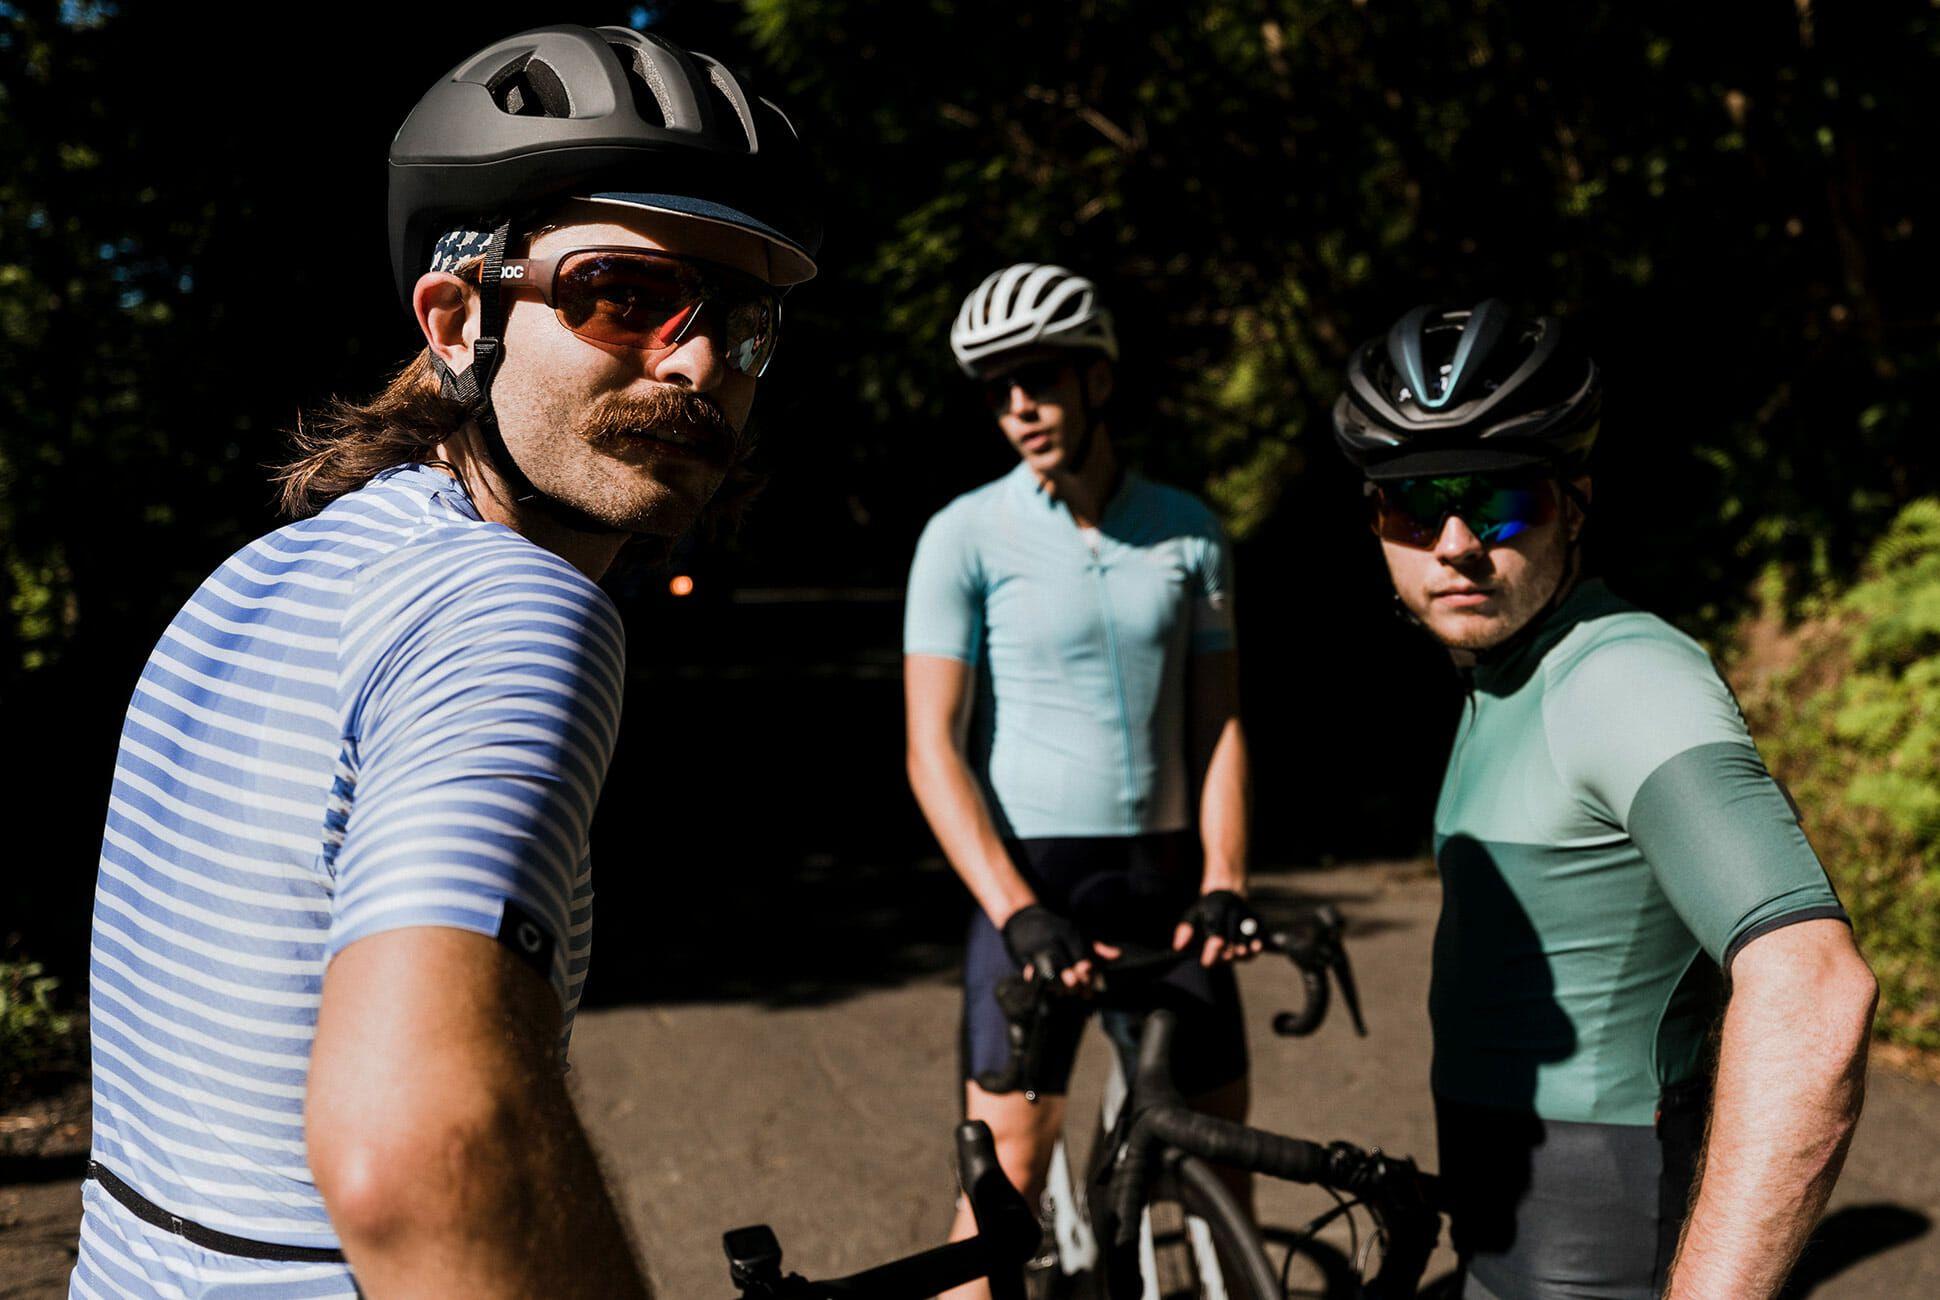 Summer-Cycling-Kits-2018-gear-patrol-ctb-slide-4